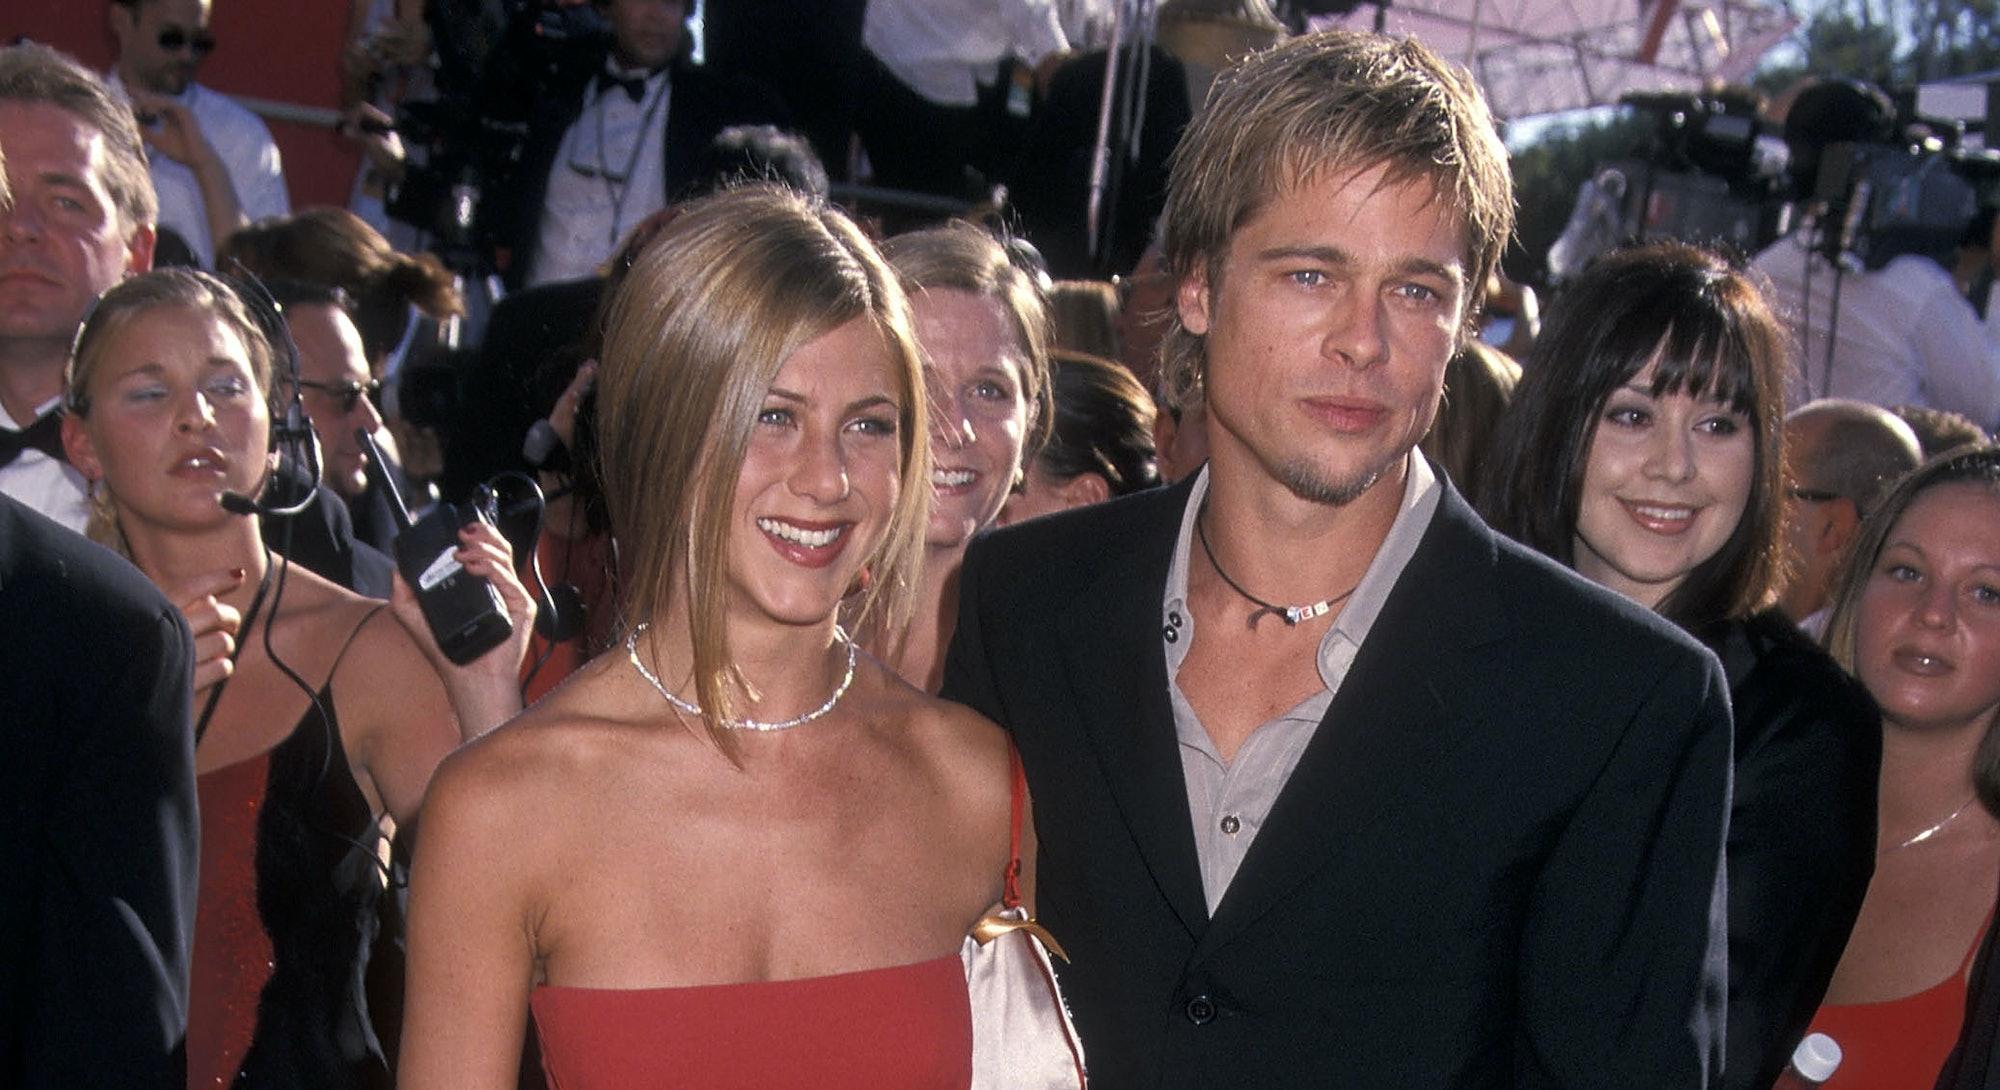 Brad Pitt and Jennifer Aniston at the 2000 Emmys.